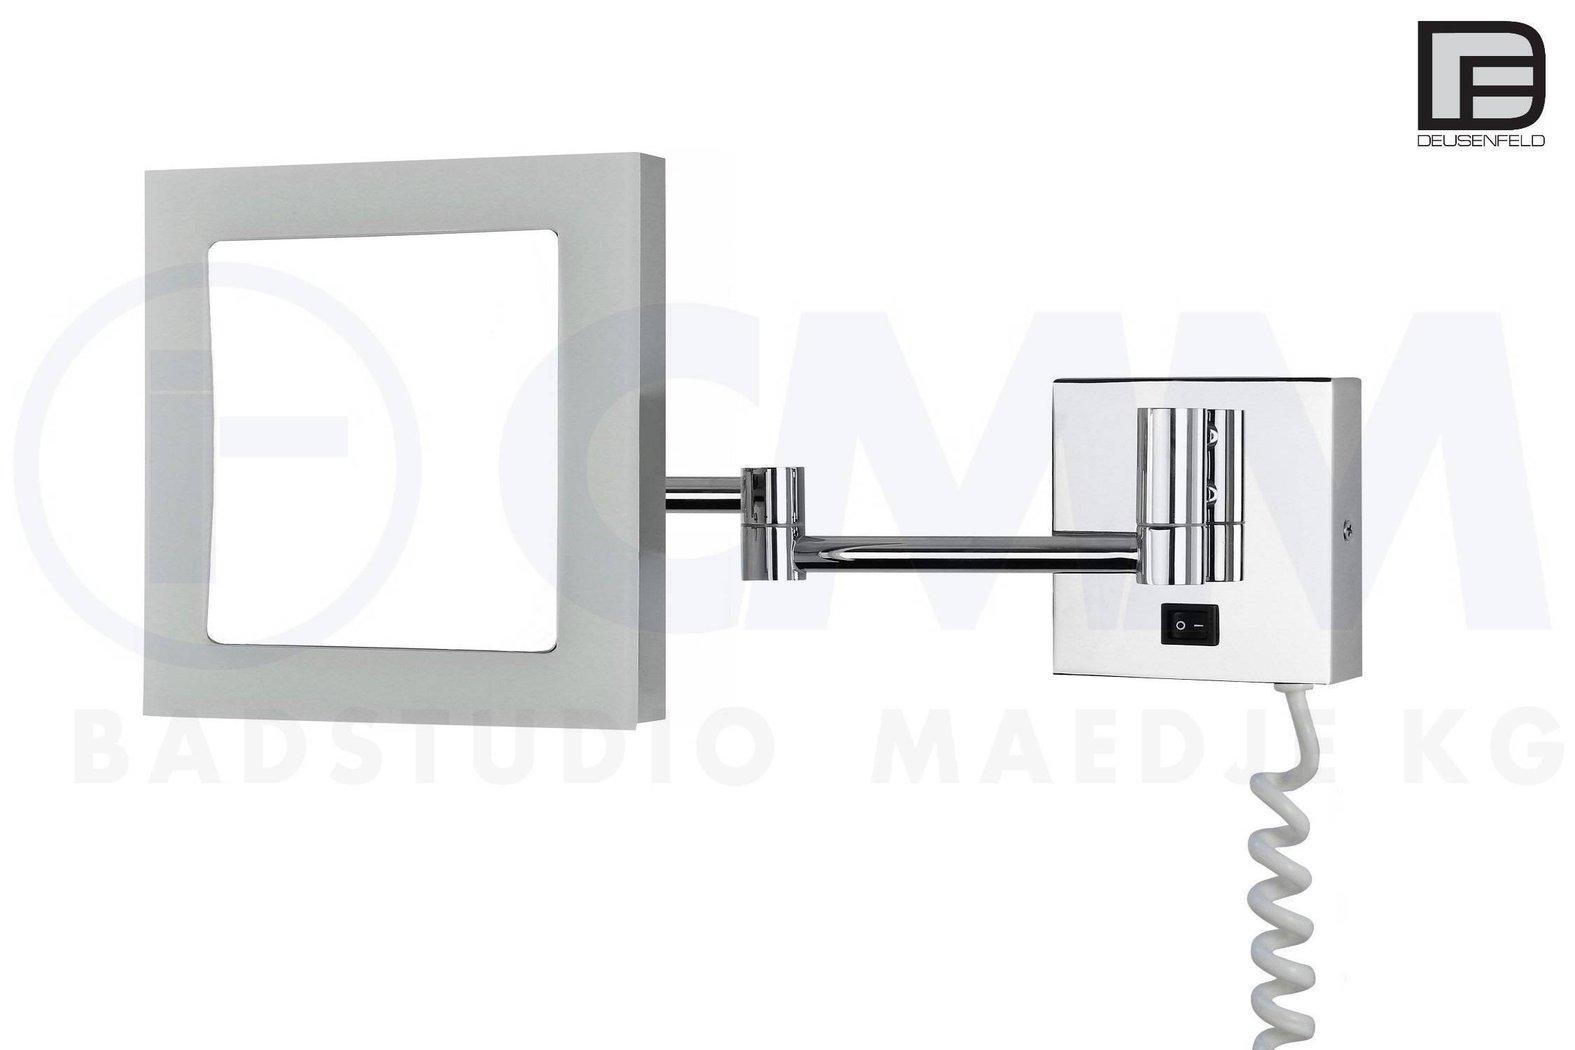 deusenfeld kp544 led kosmetikspiegel quadro 5x vergr erung 20 5cm pmma leuchtfeld tageslicht. Black Bedroom Furniture Sets. Home Design Ideas